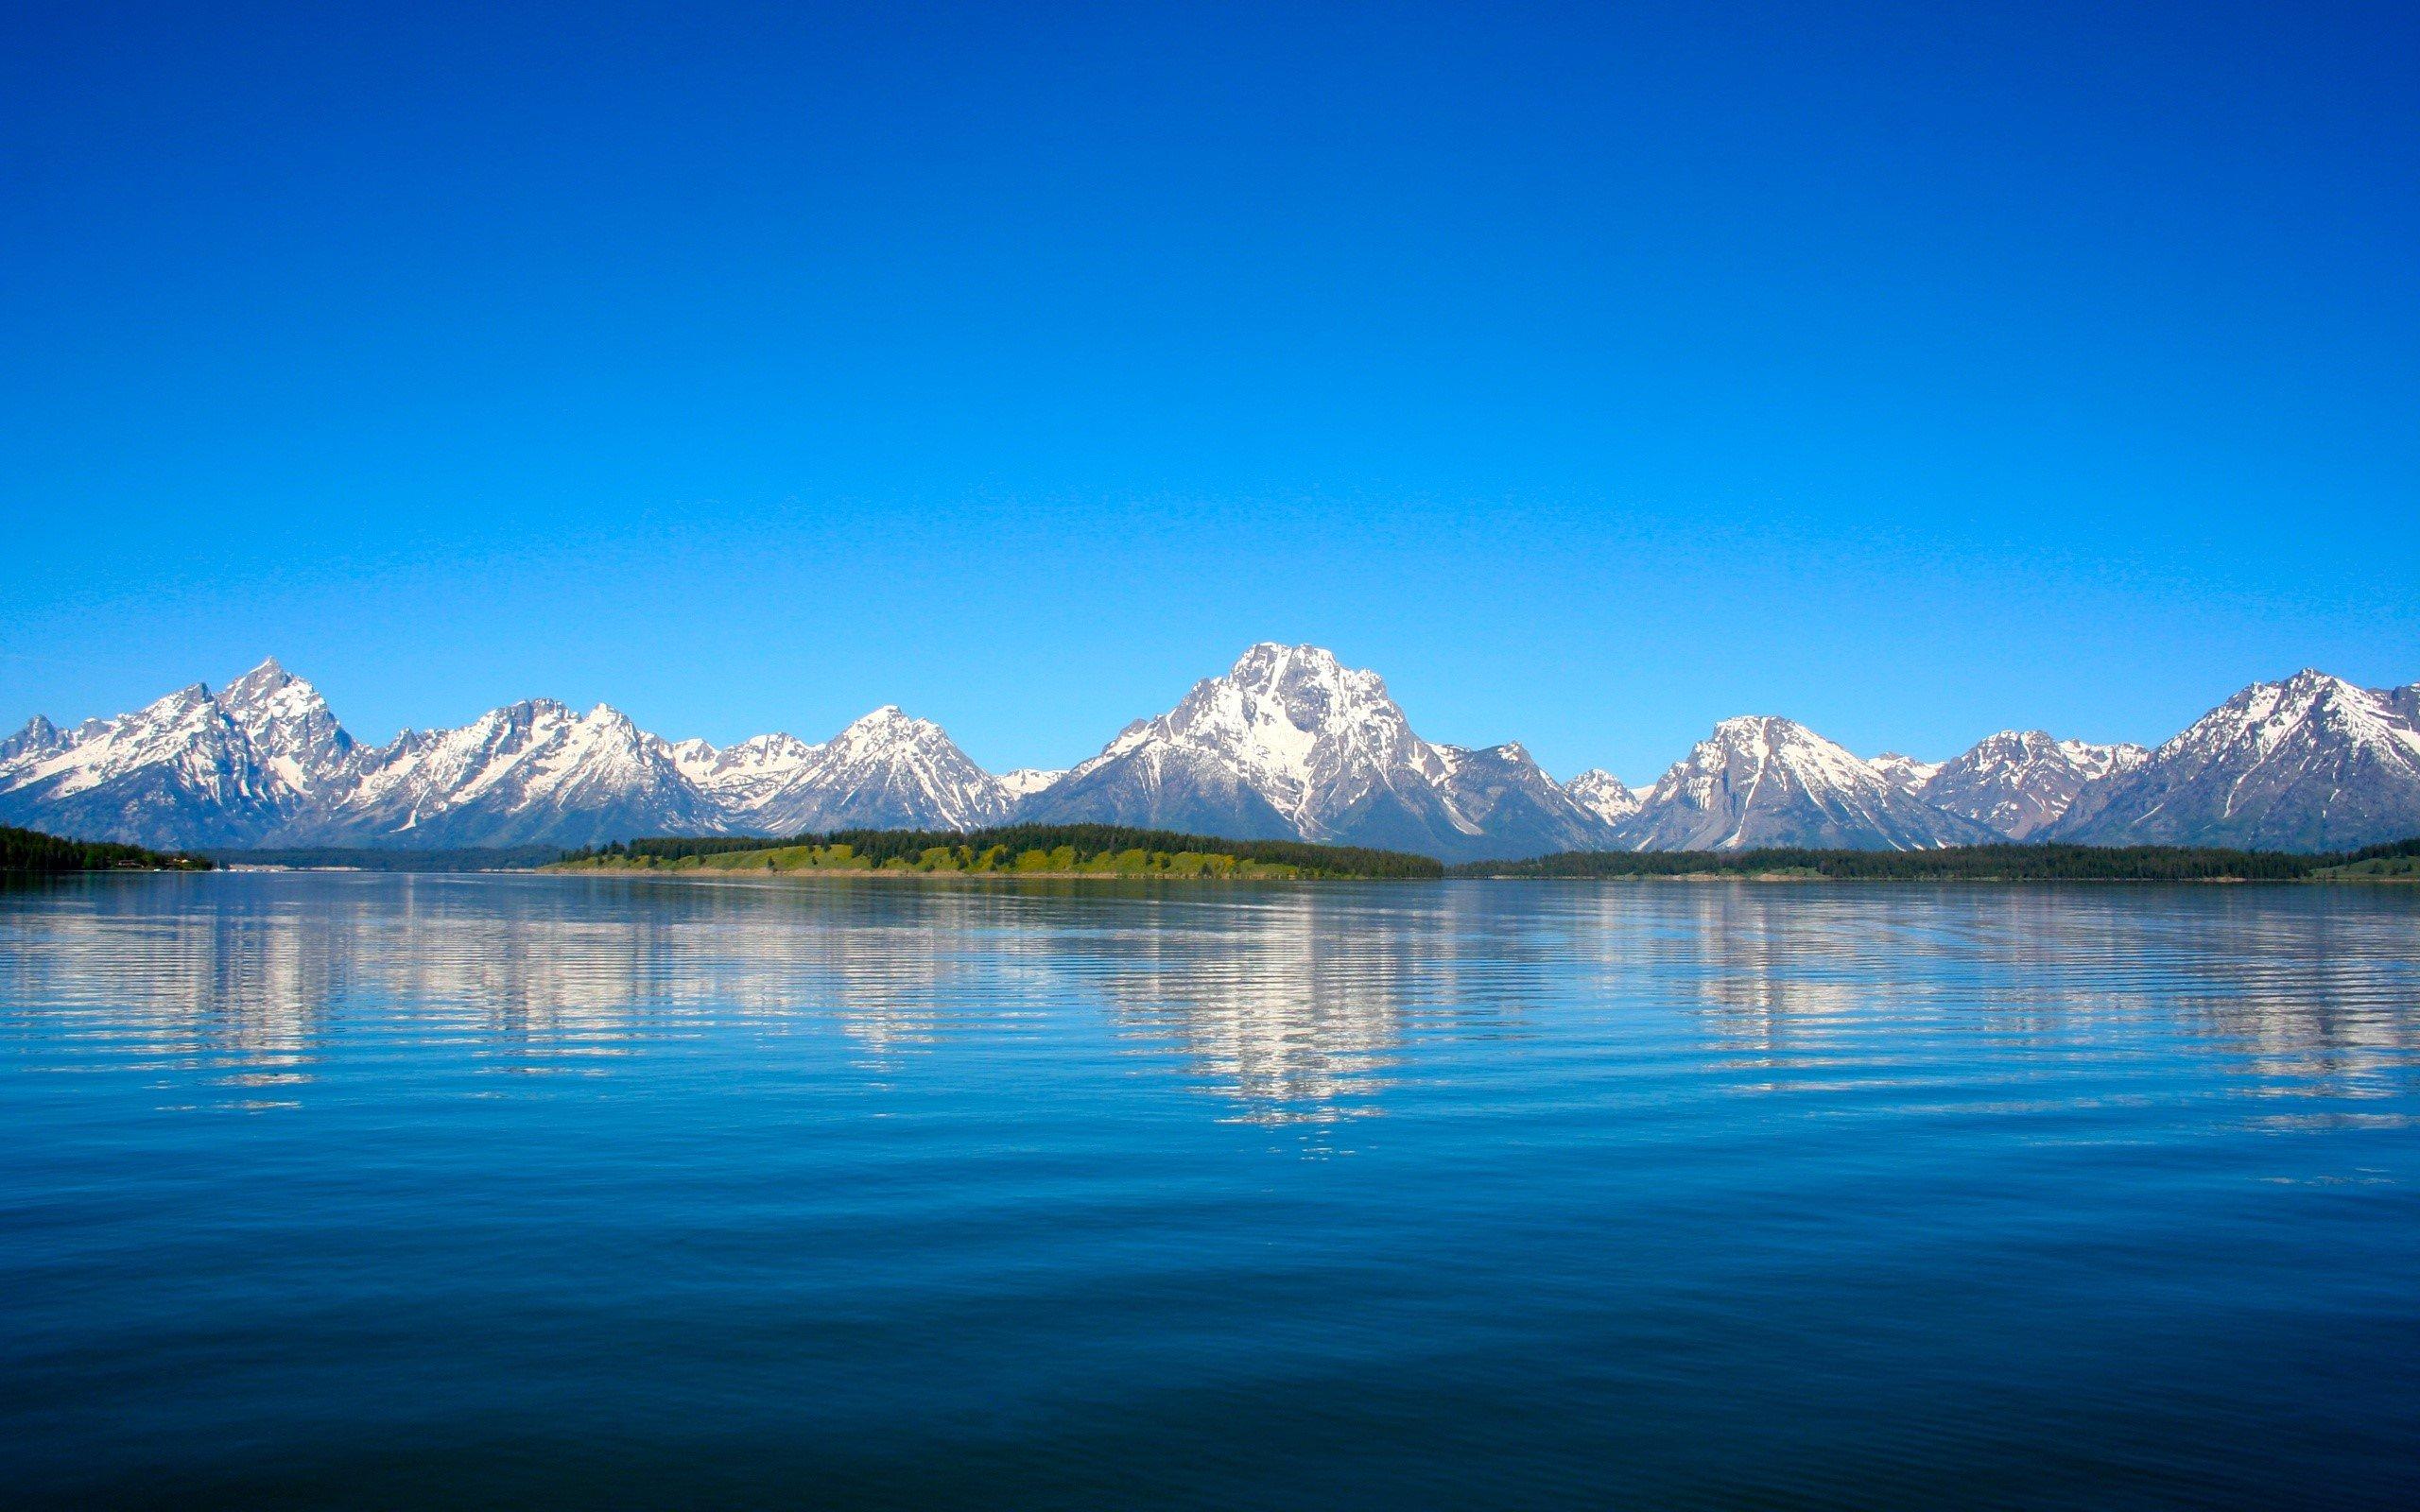 Fondo de pantalla de Parque Nacional Grand Teton Imágenes